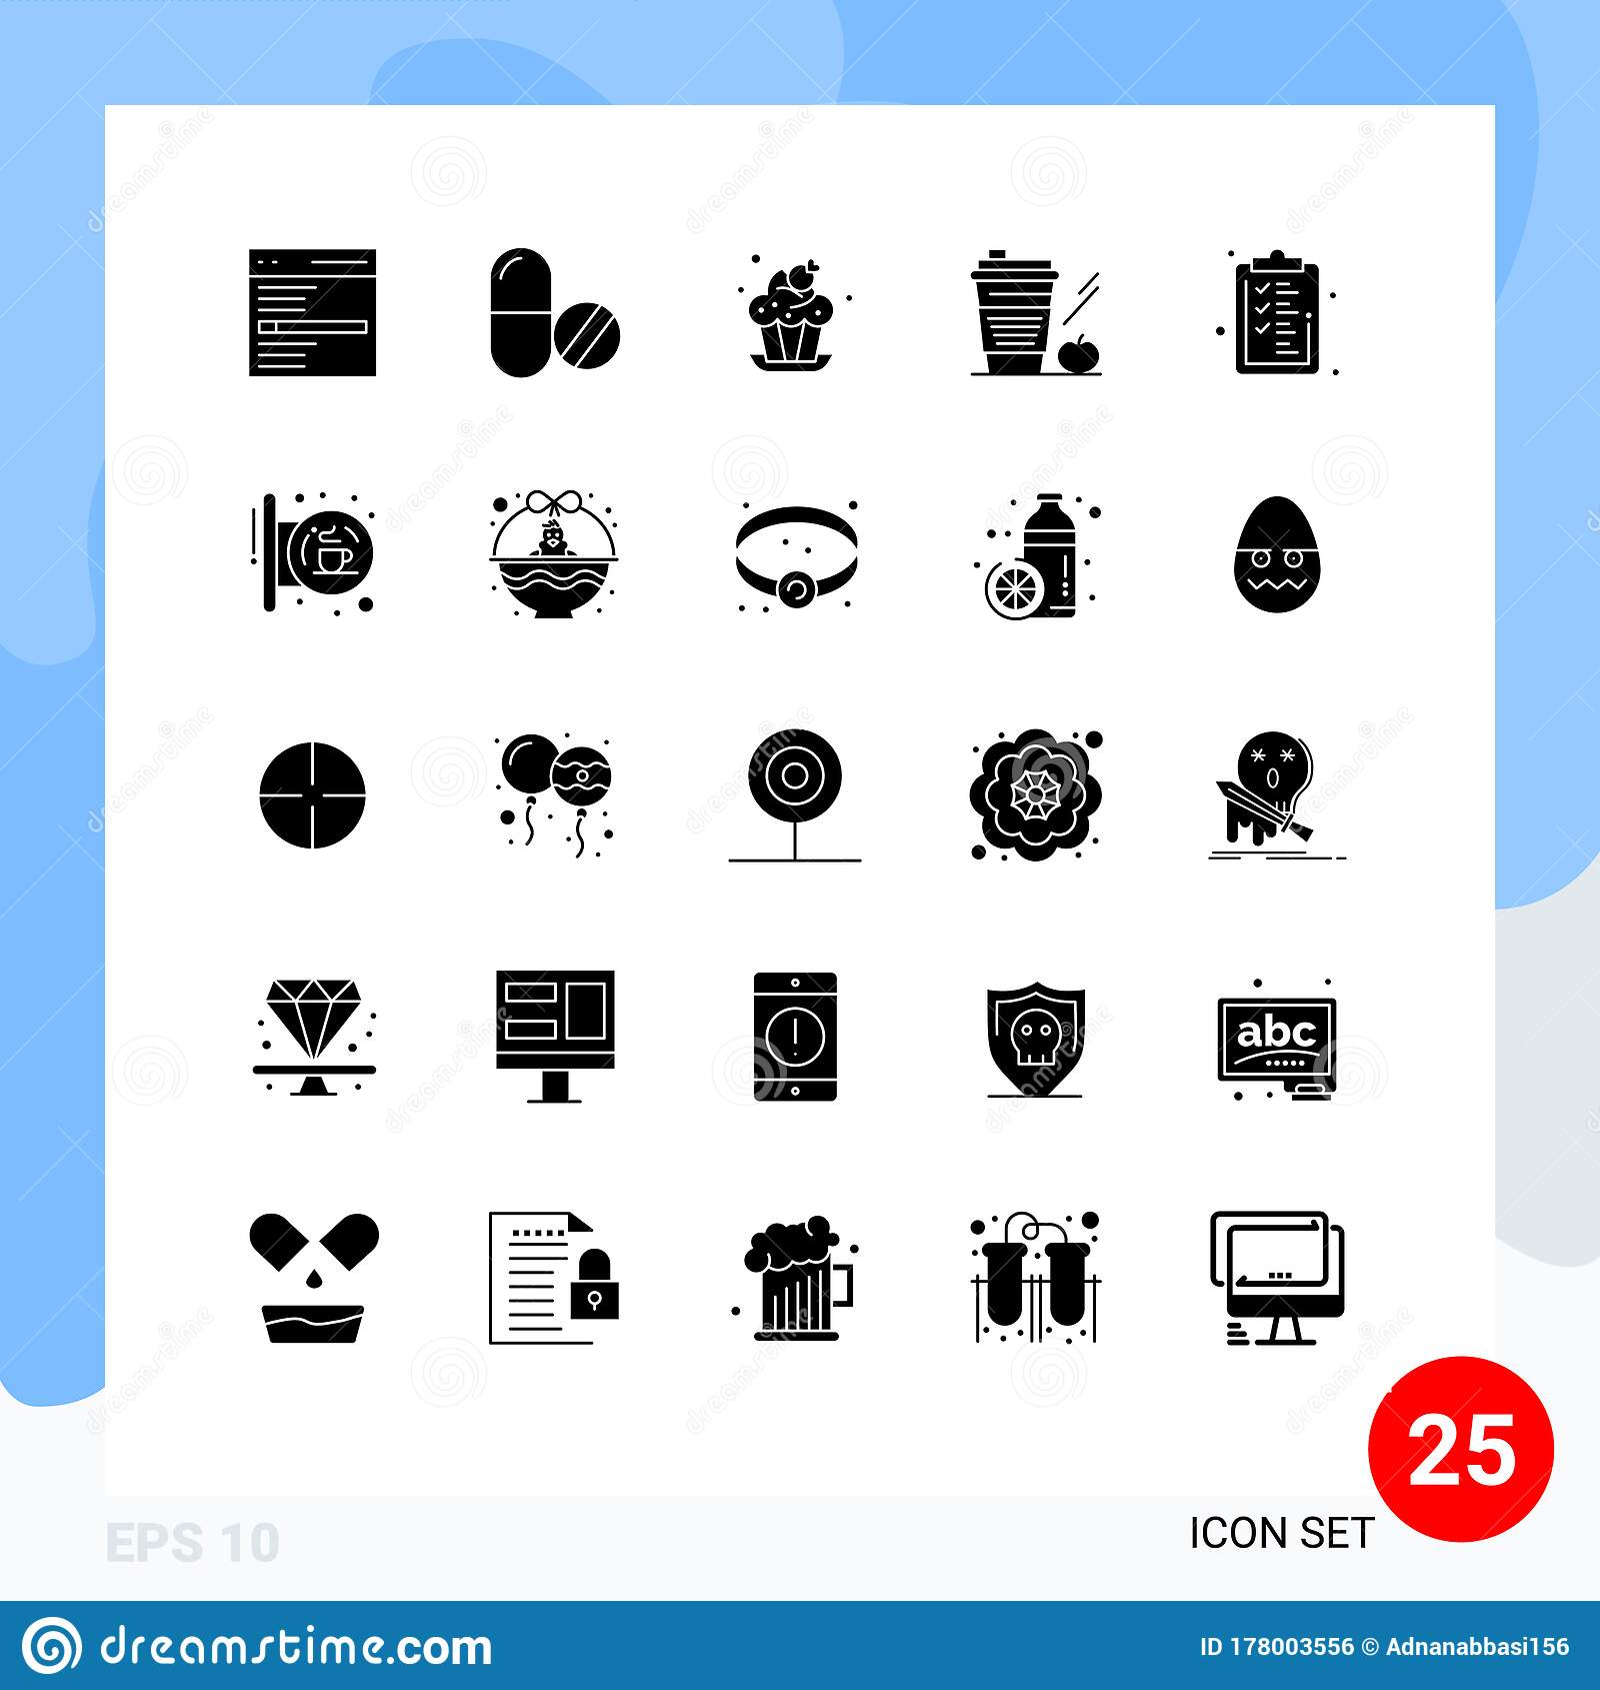 25 Creative Icons Modern Signs And Symbols Of Glass Apple Tablet Starbucks Dessert Stock Vector Illustration Of Basket Bakery 178003556